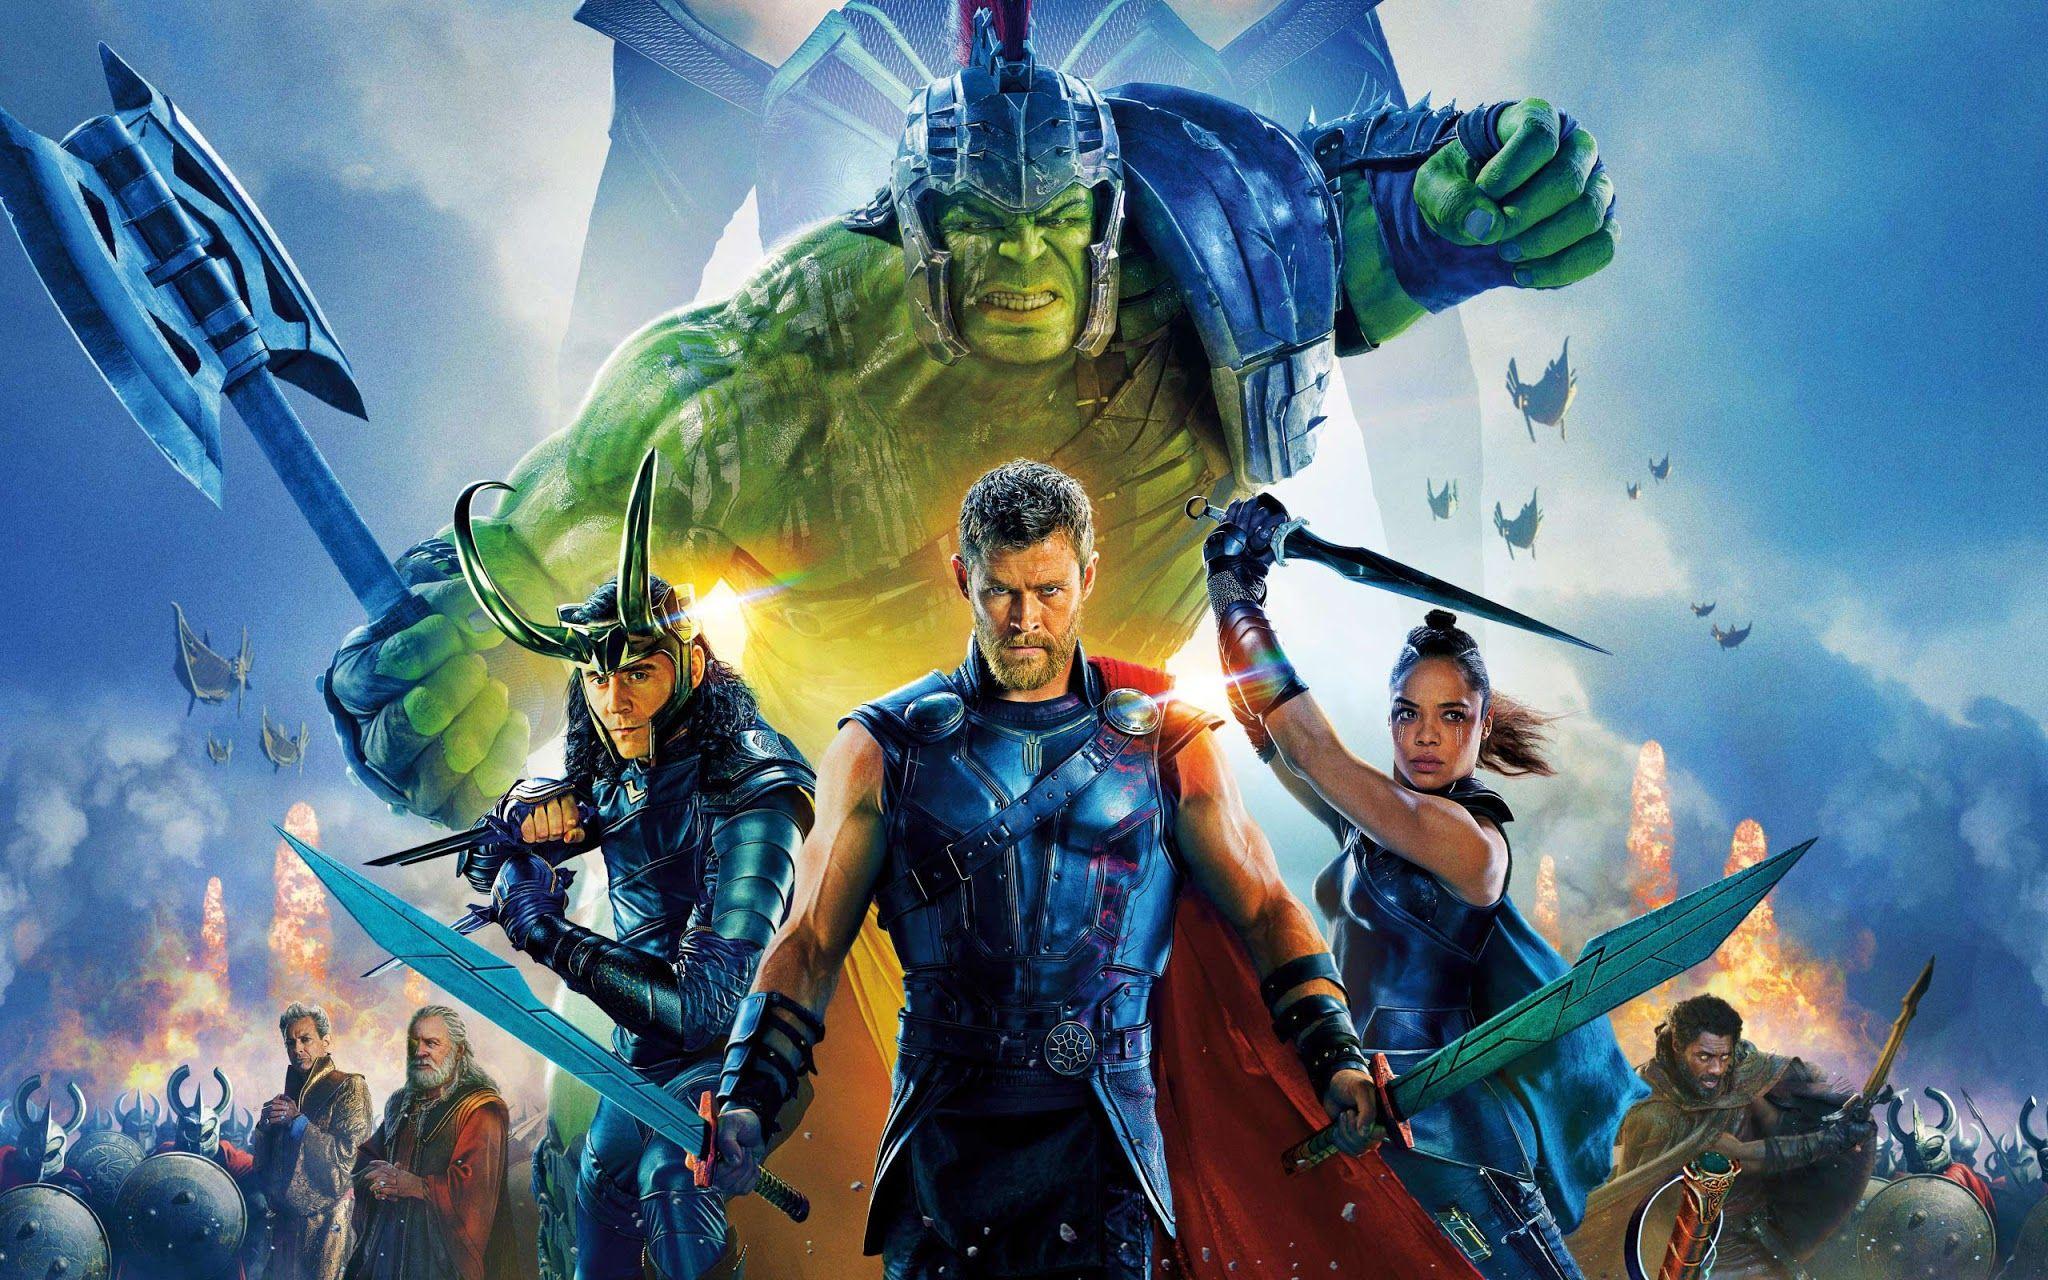 Thor Ragnarok Hd 4k 2017 2560x1600 Jpg 2048 1280 Thor Ragnarok Full Movie Thor Thor Wallpaper